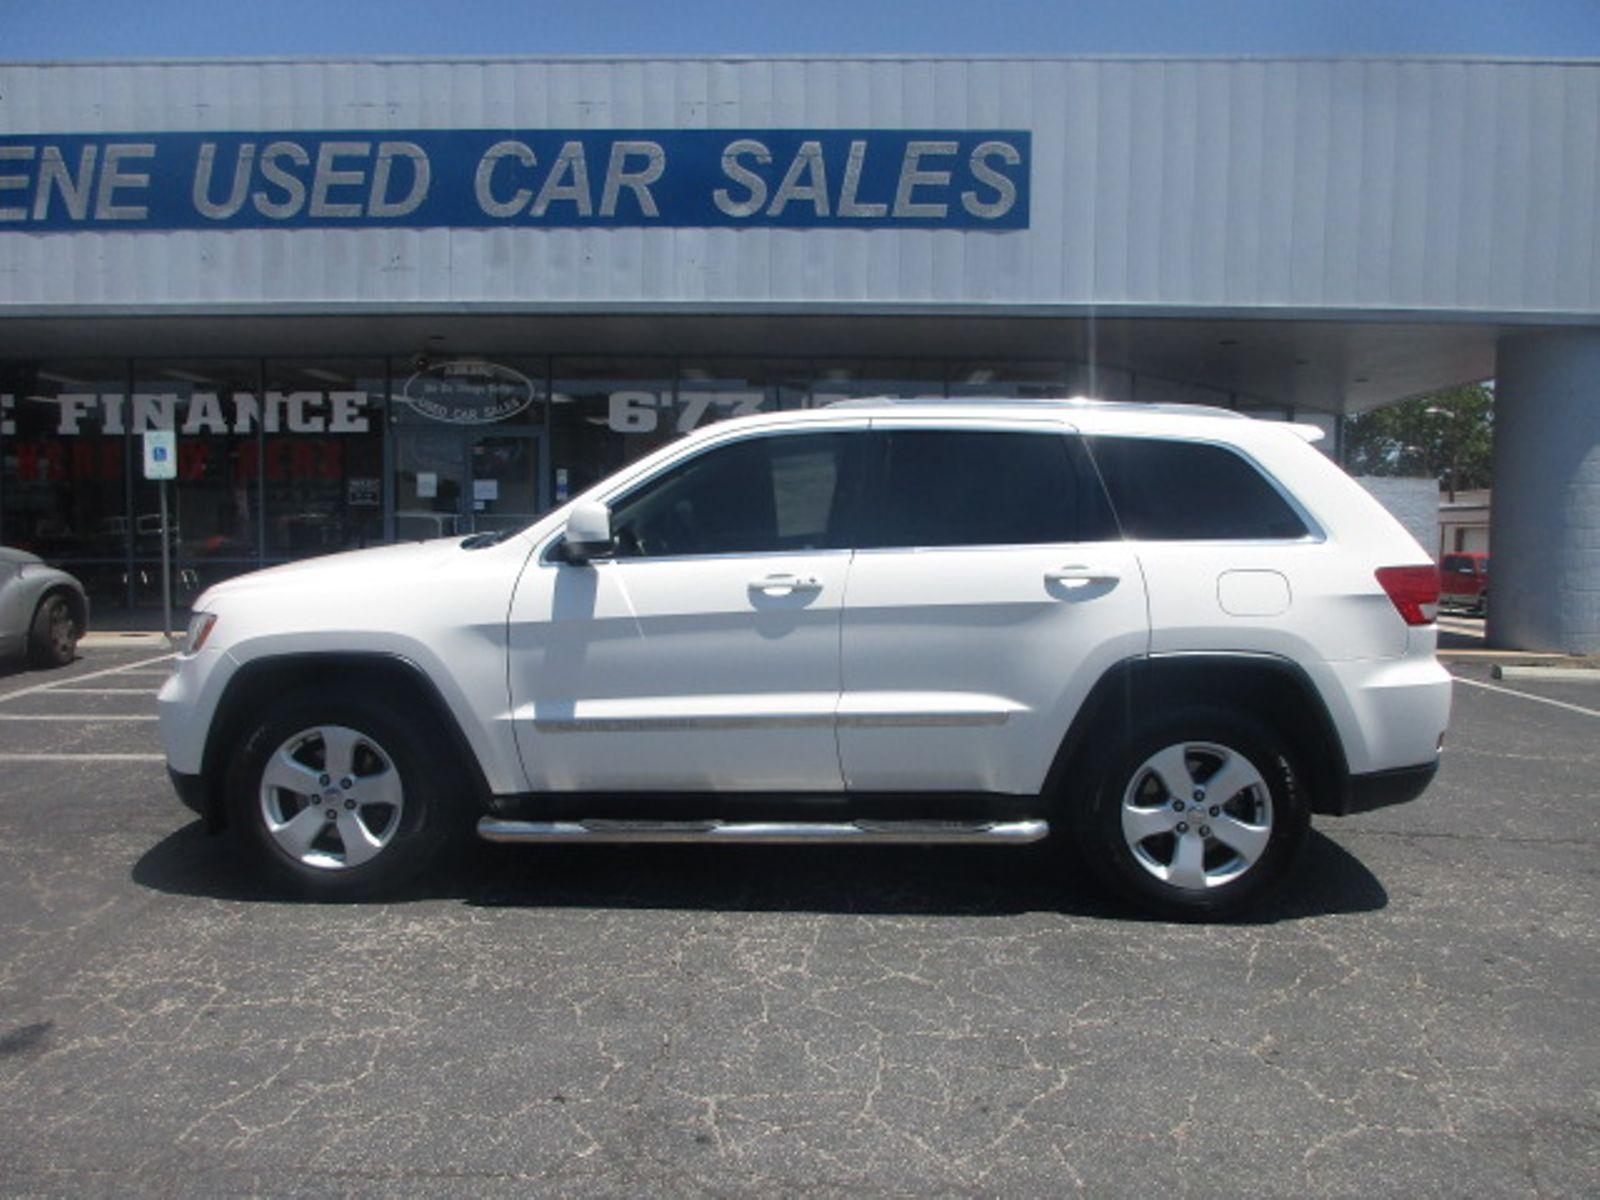 abilene used car sales abilene tx  2011 Jeep Grand Cherokee Laredo Abilene TX Abilene Used Car Sales